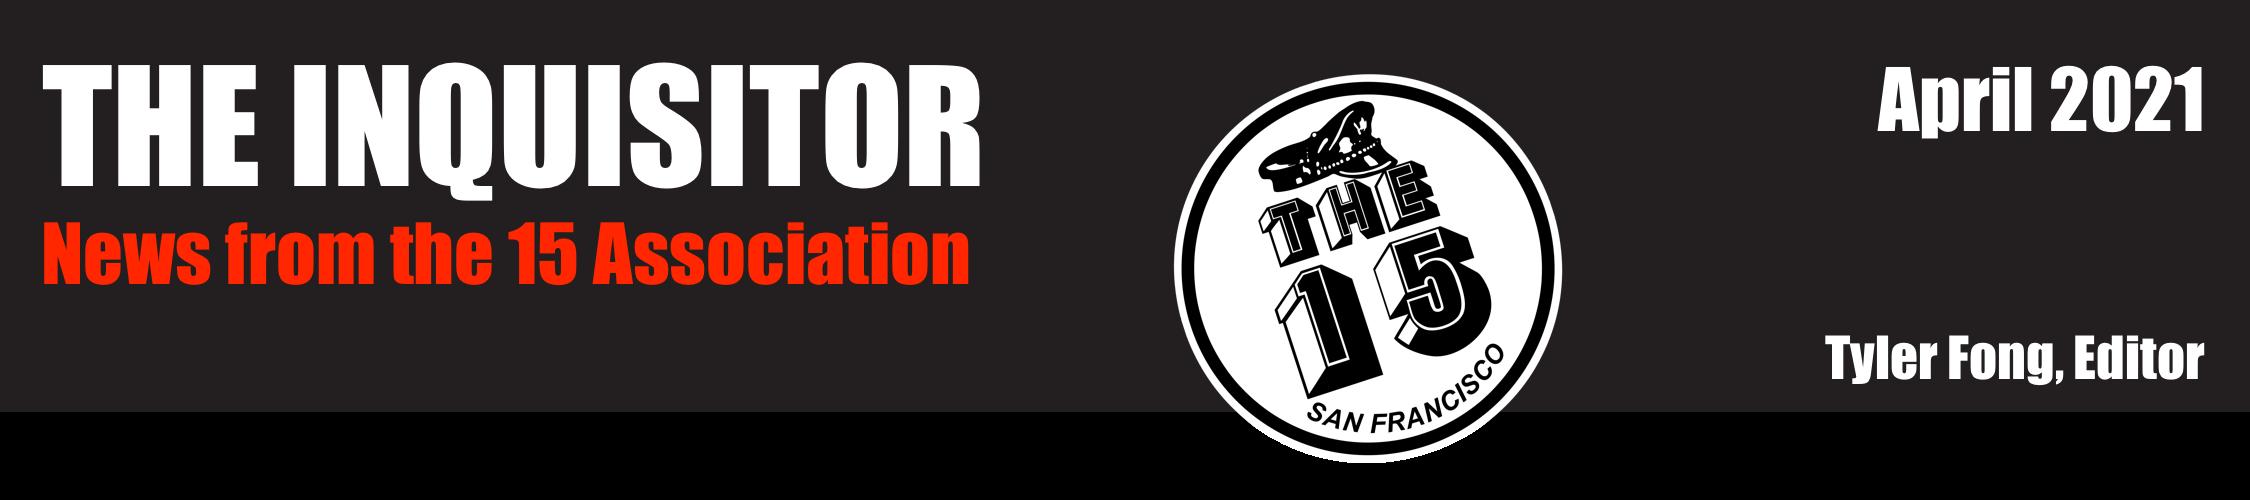 The Inquisitor - April 2021